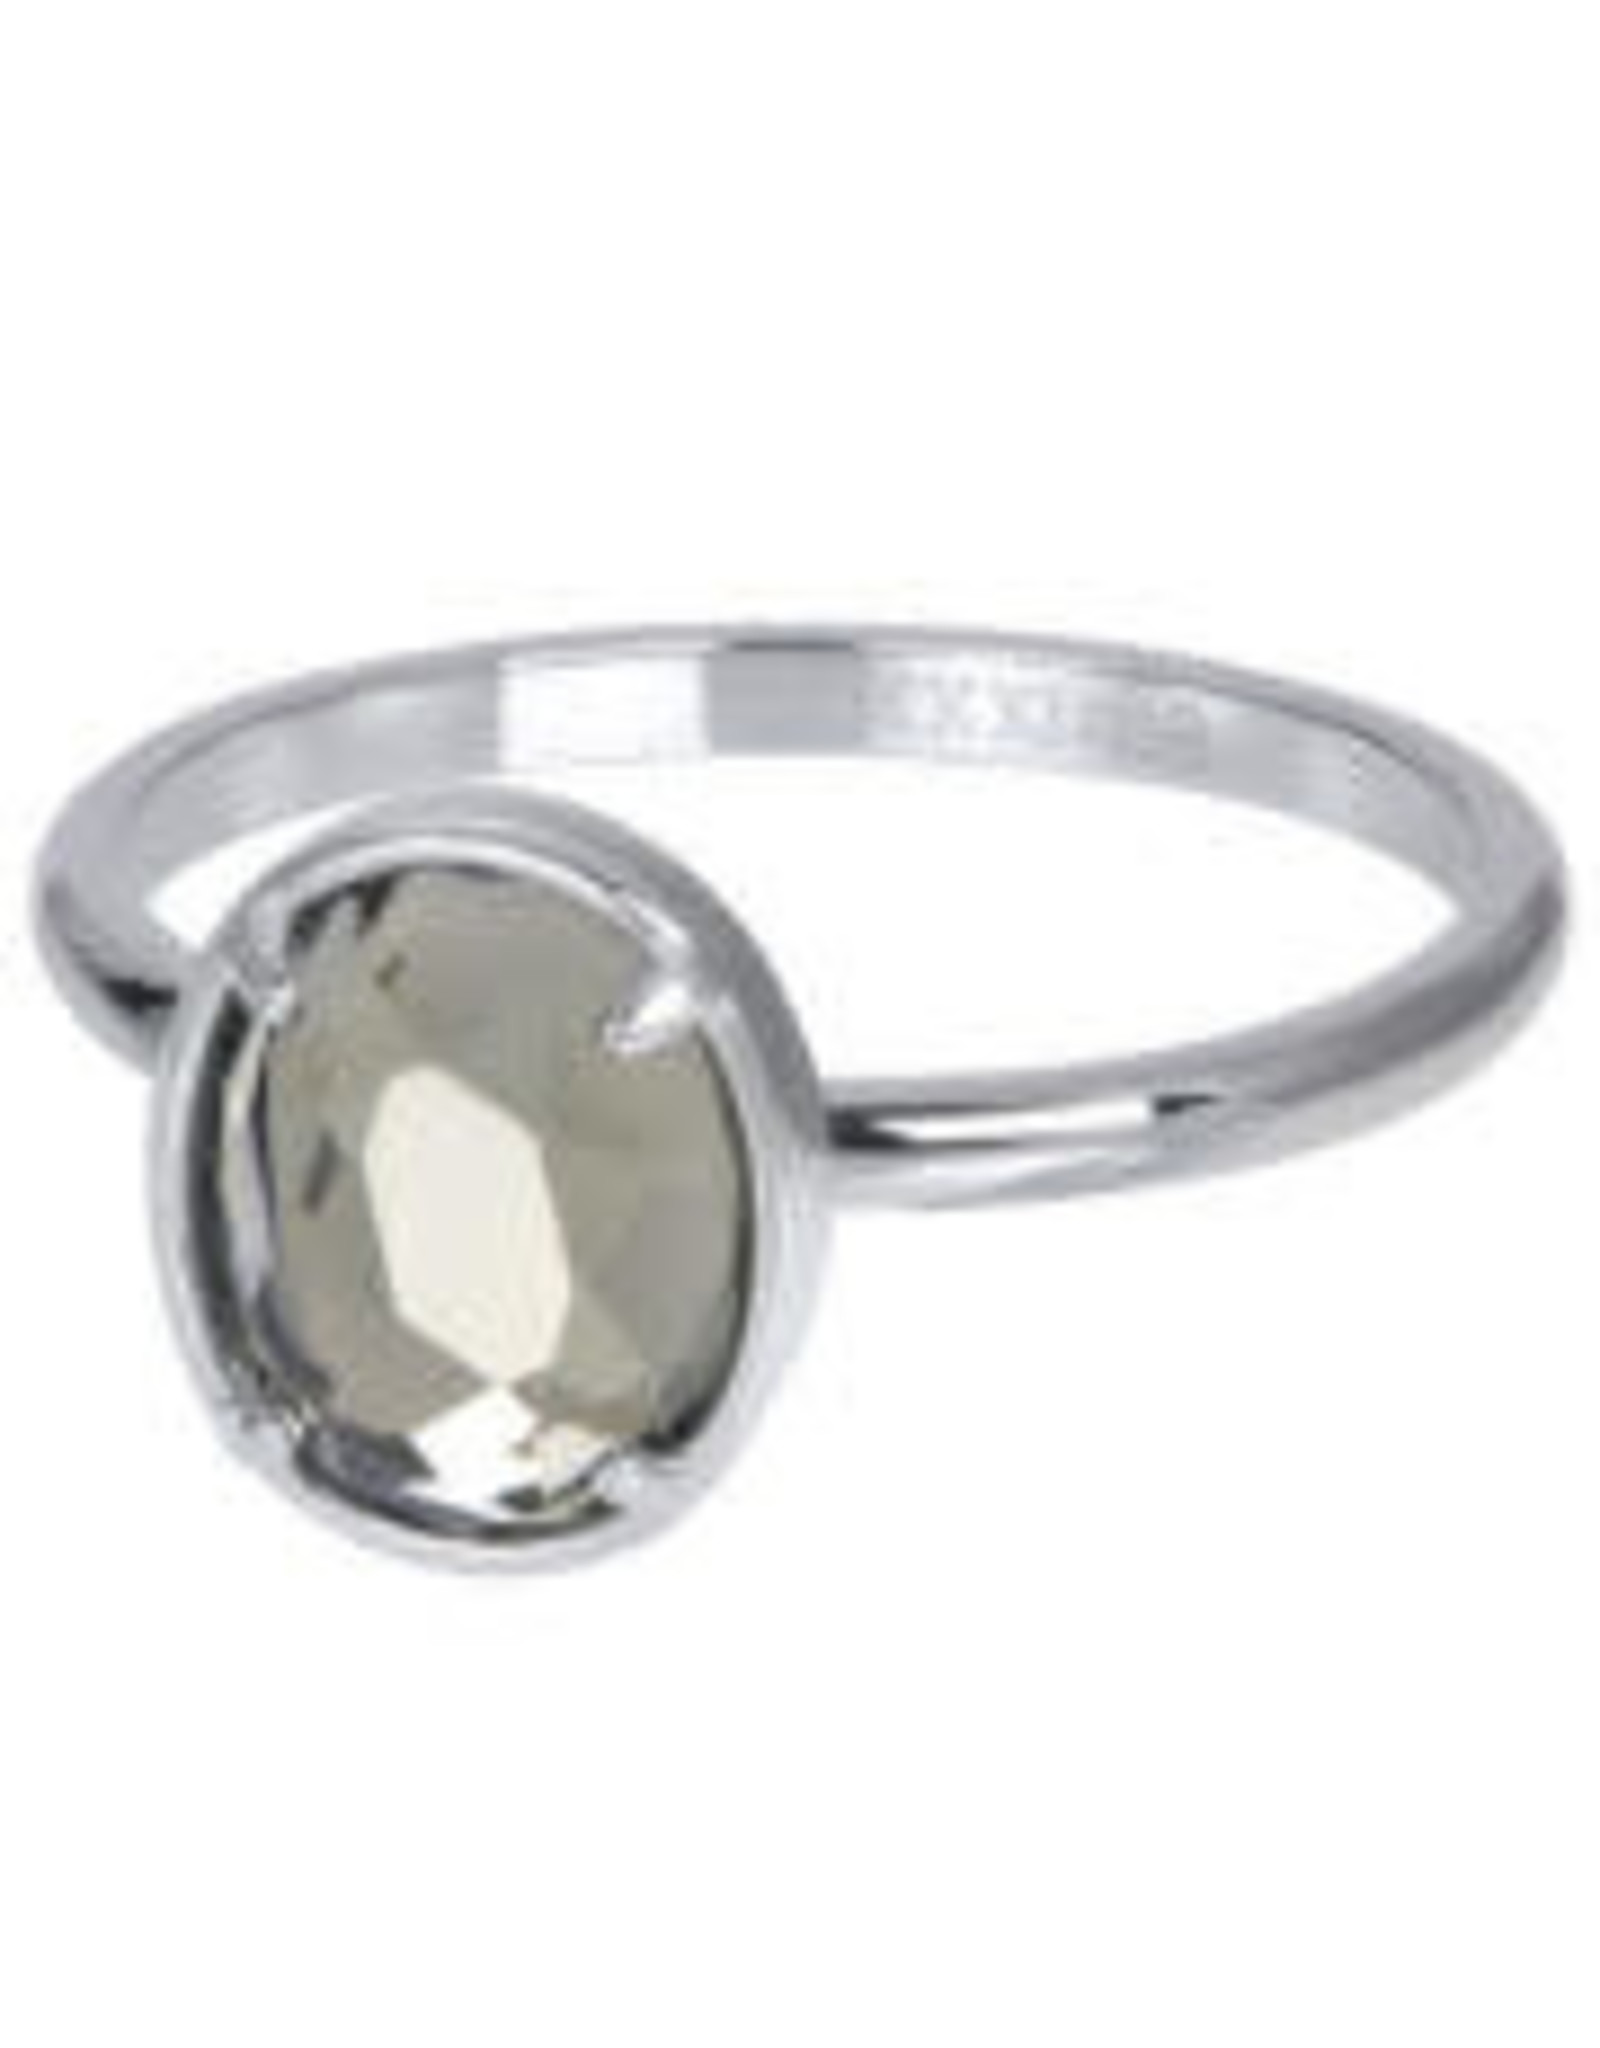 IXXXI IXXXI Glam Oval ring Silver